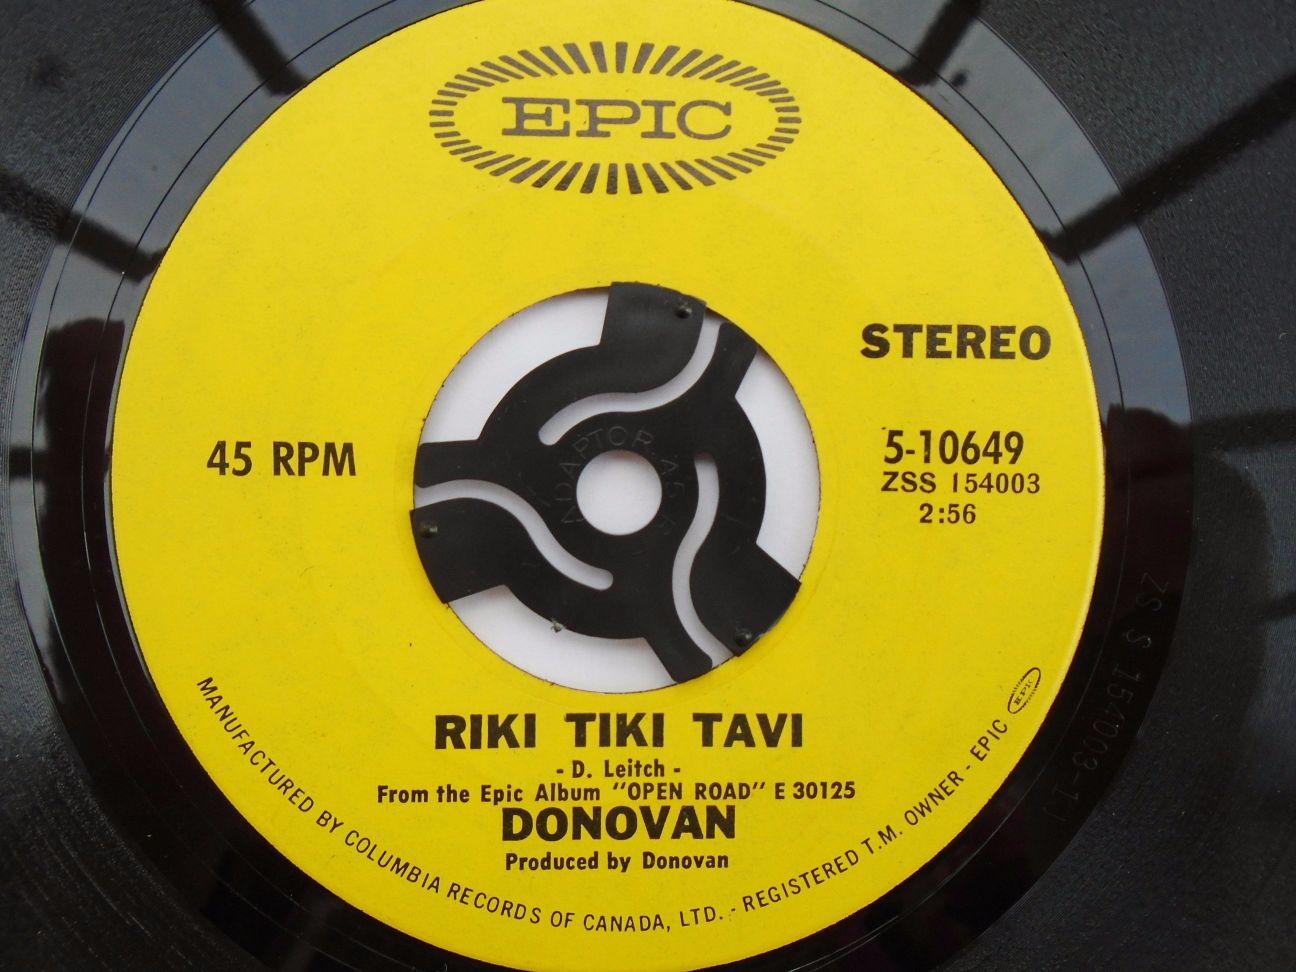 Riki Tiki Tavi/roots Of Oak - Donovan